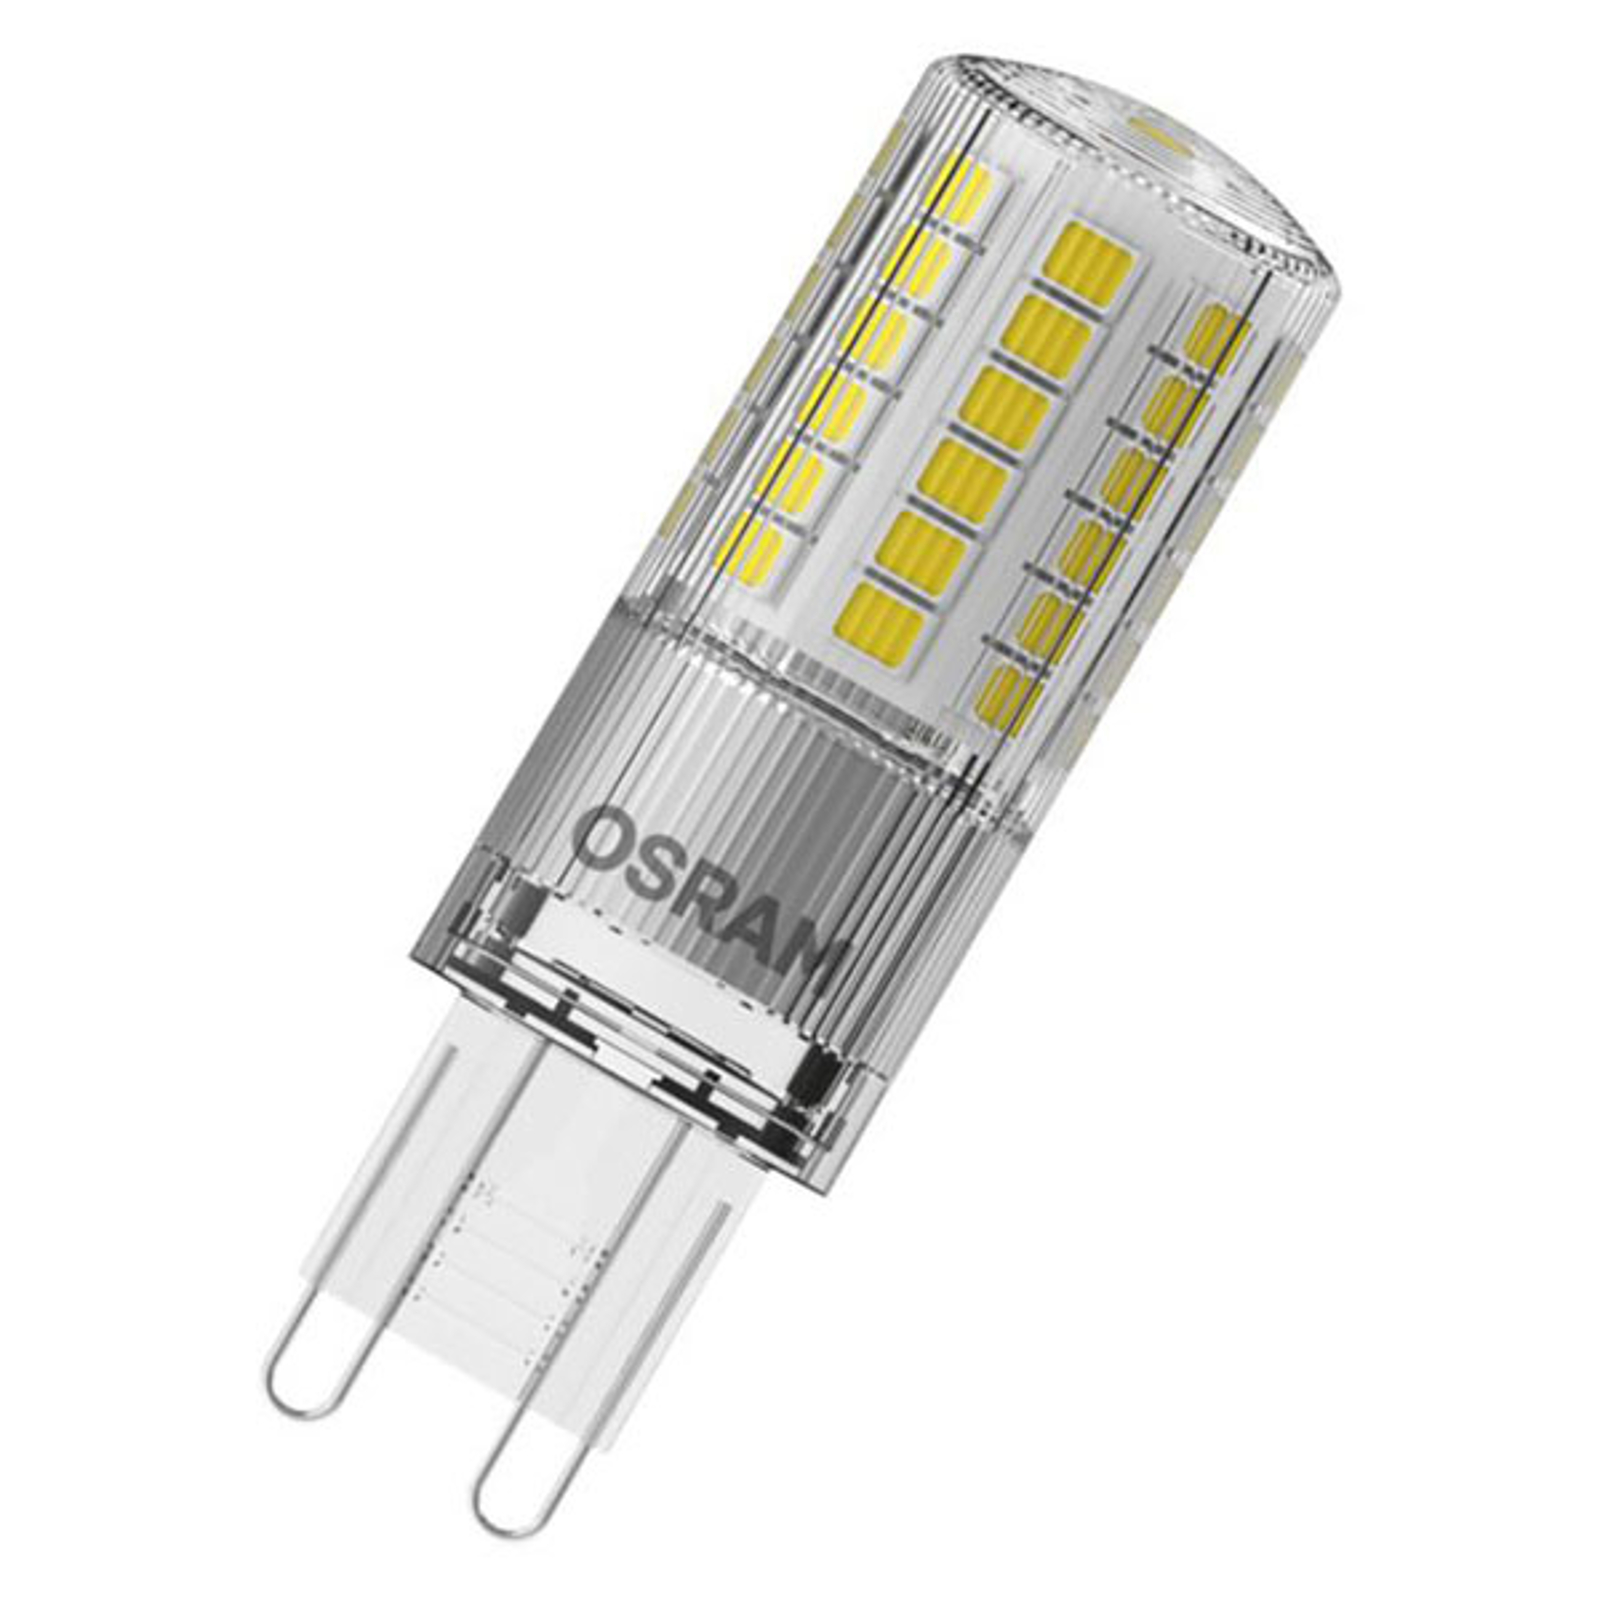 OSRAM LED-Stiftsockellampe G9 4,8W 4.000K klar